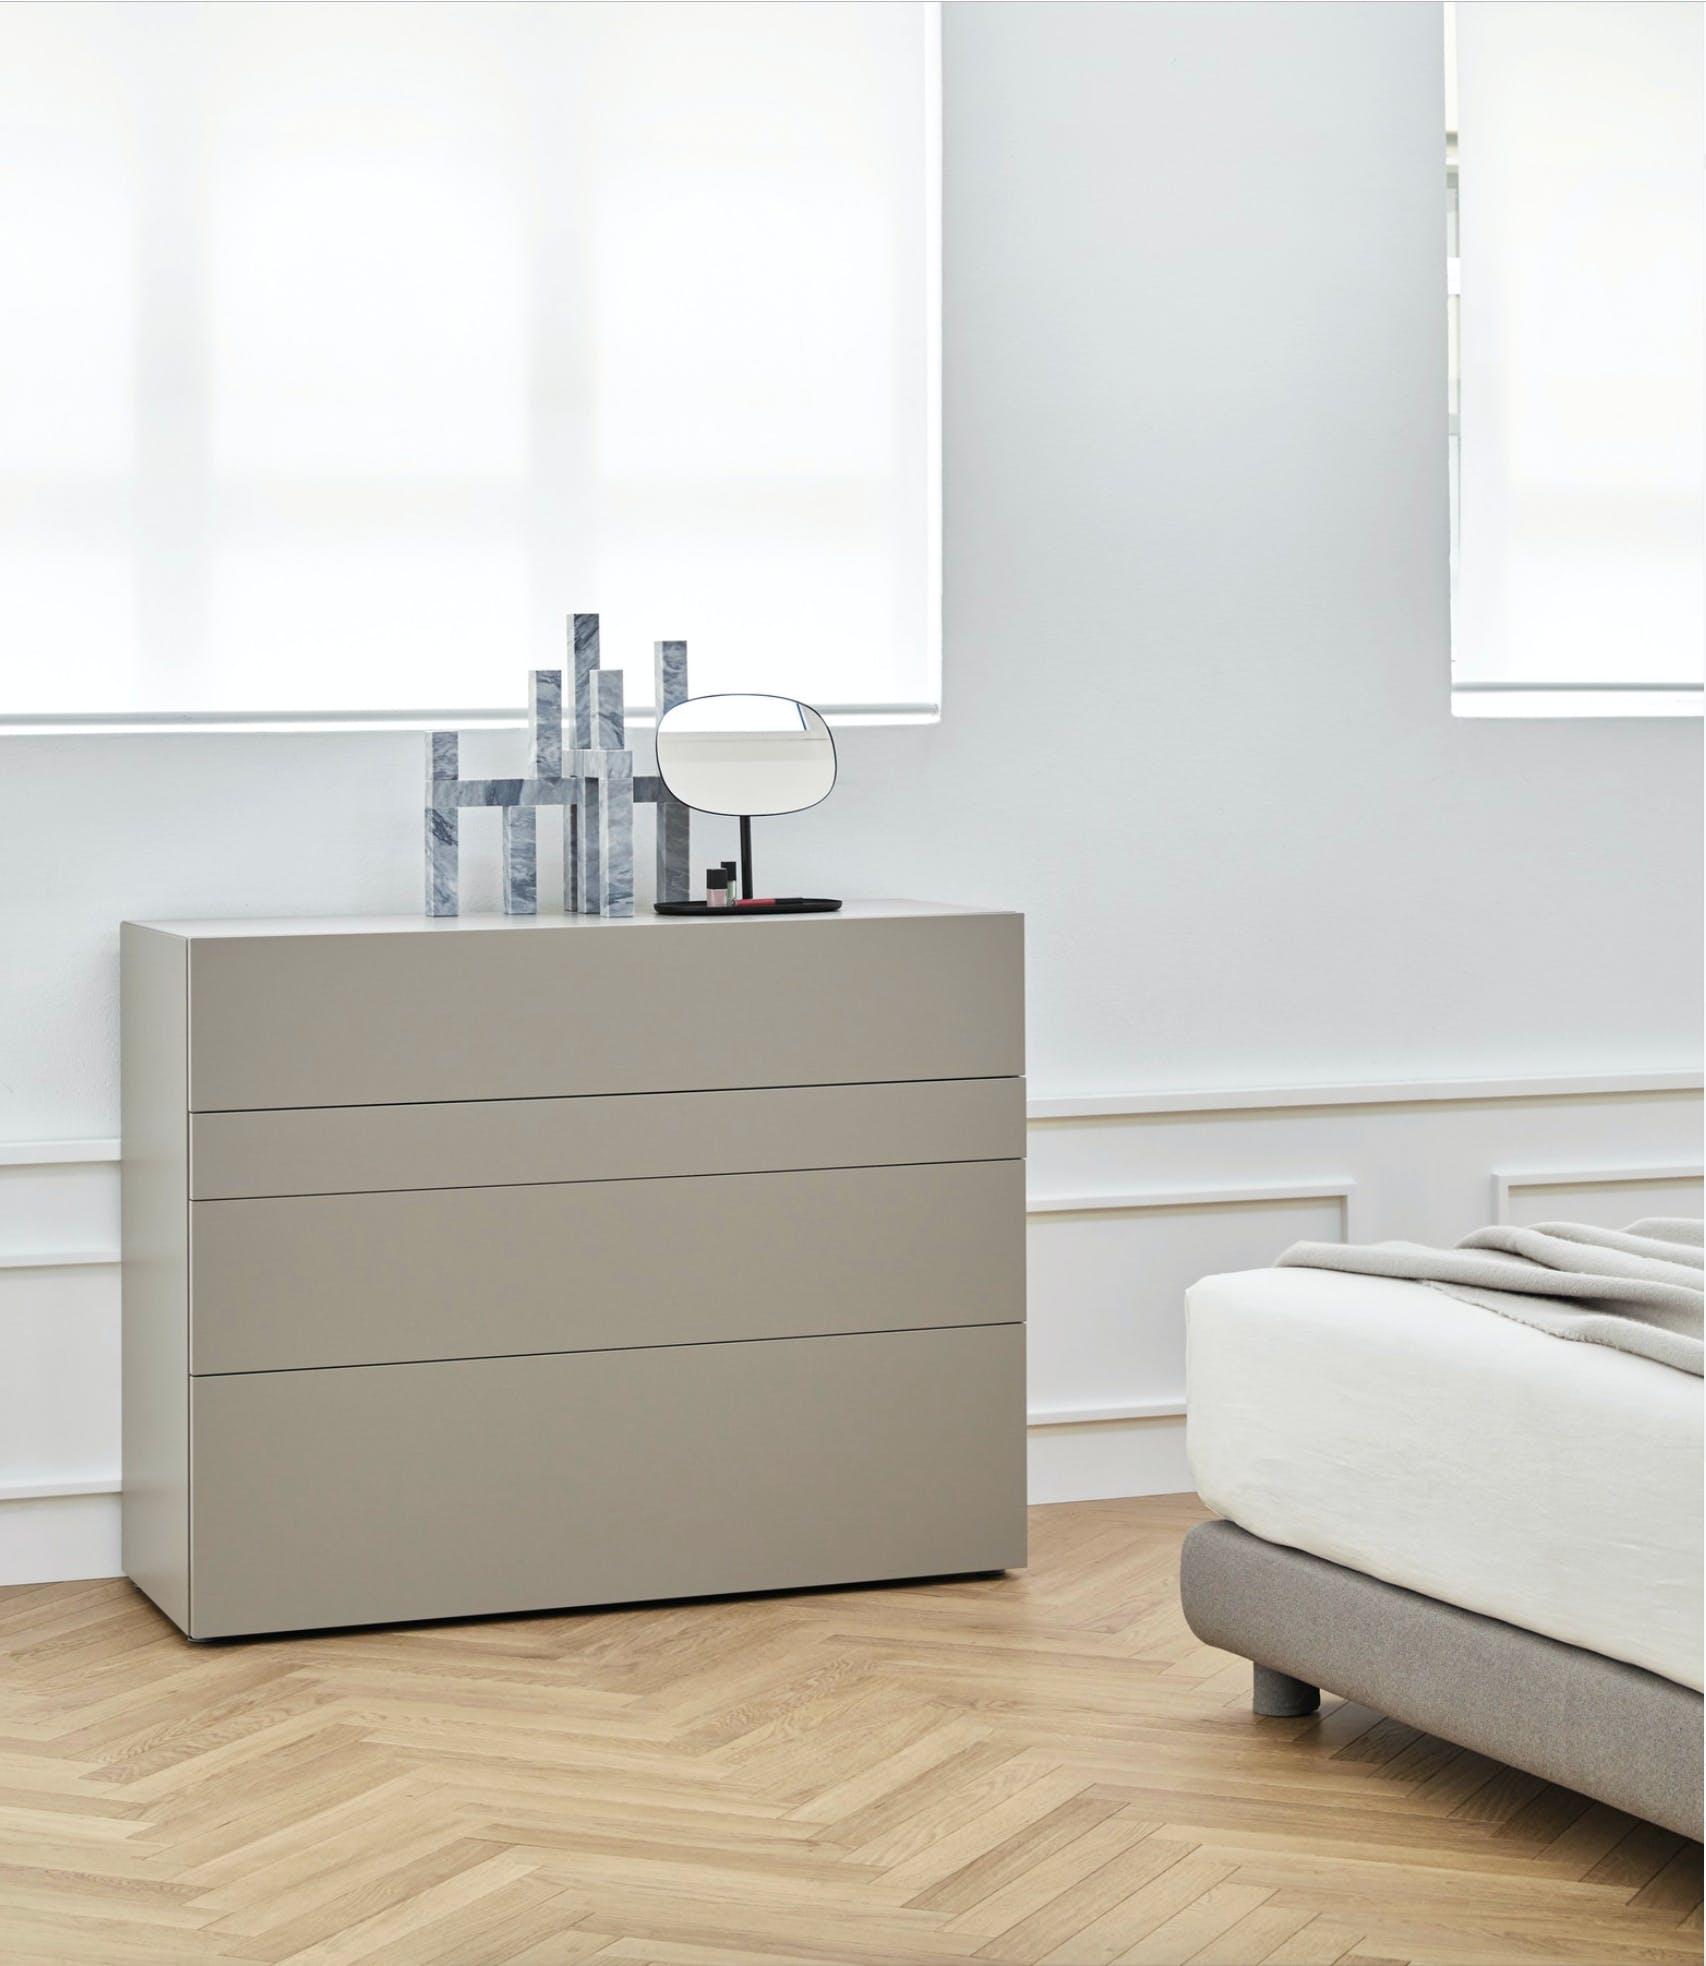 Caccaro Filnox System Front Haute Living